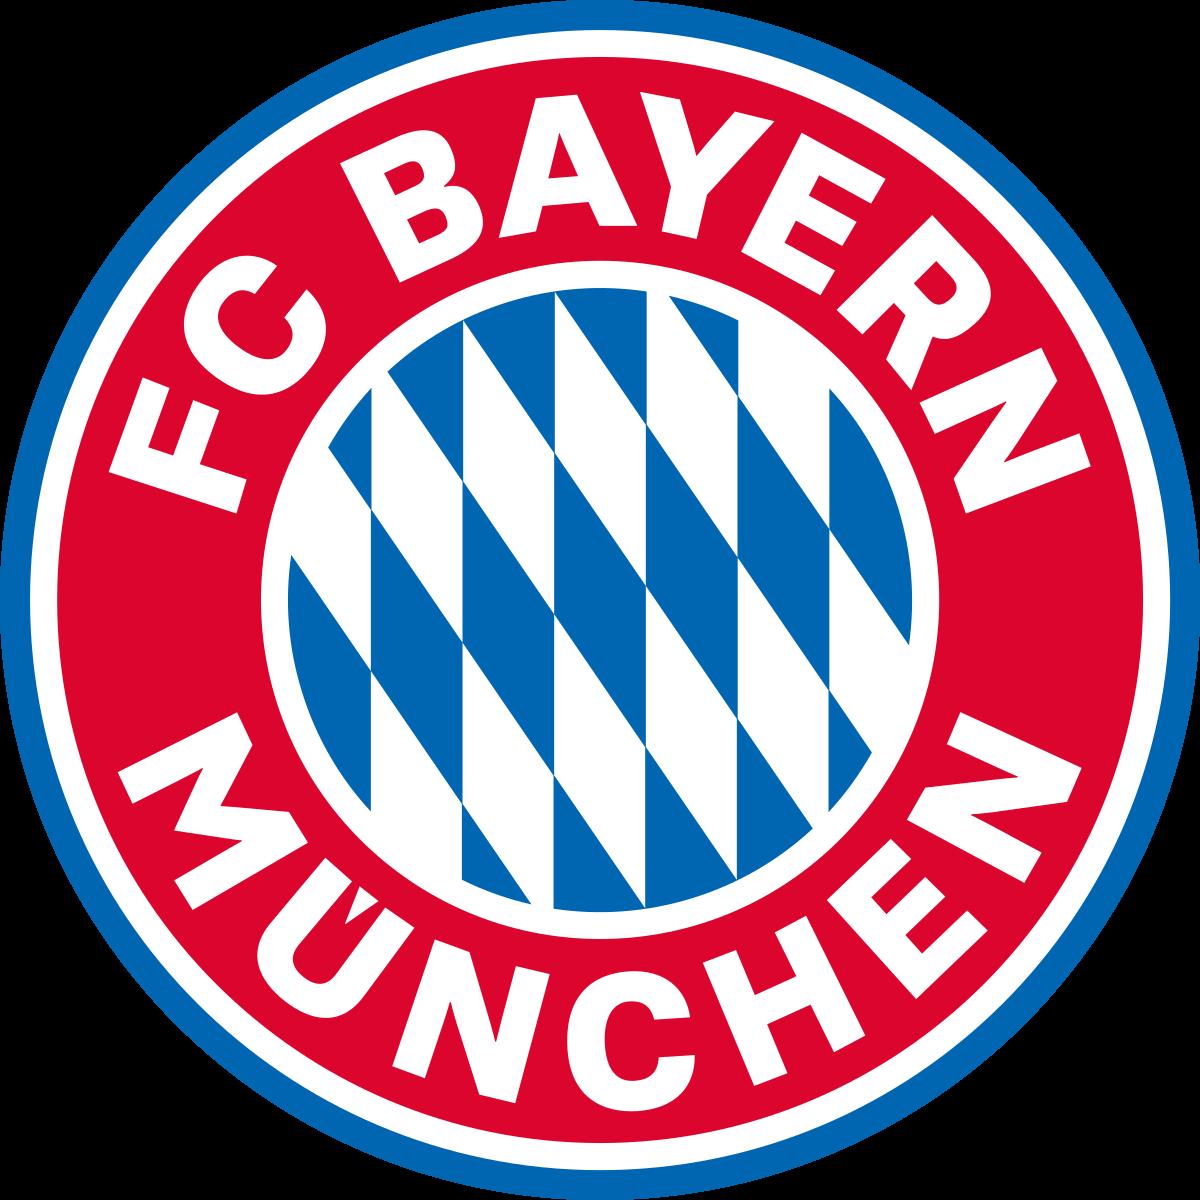 Bayern Munich escudo